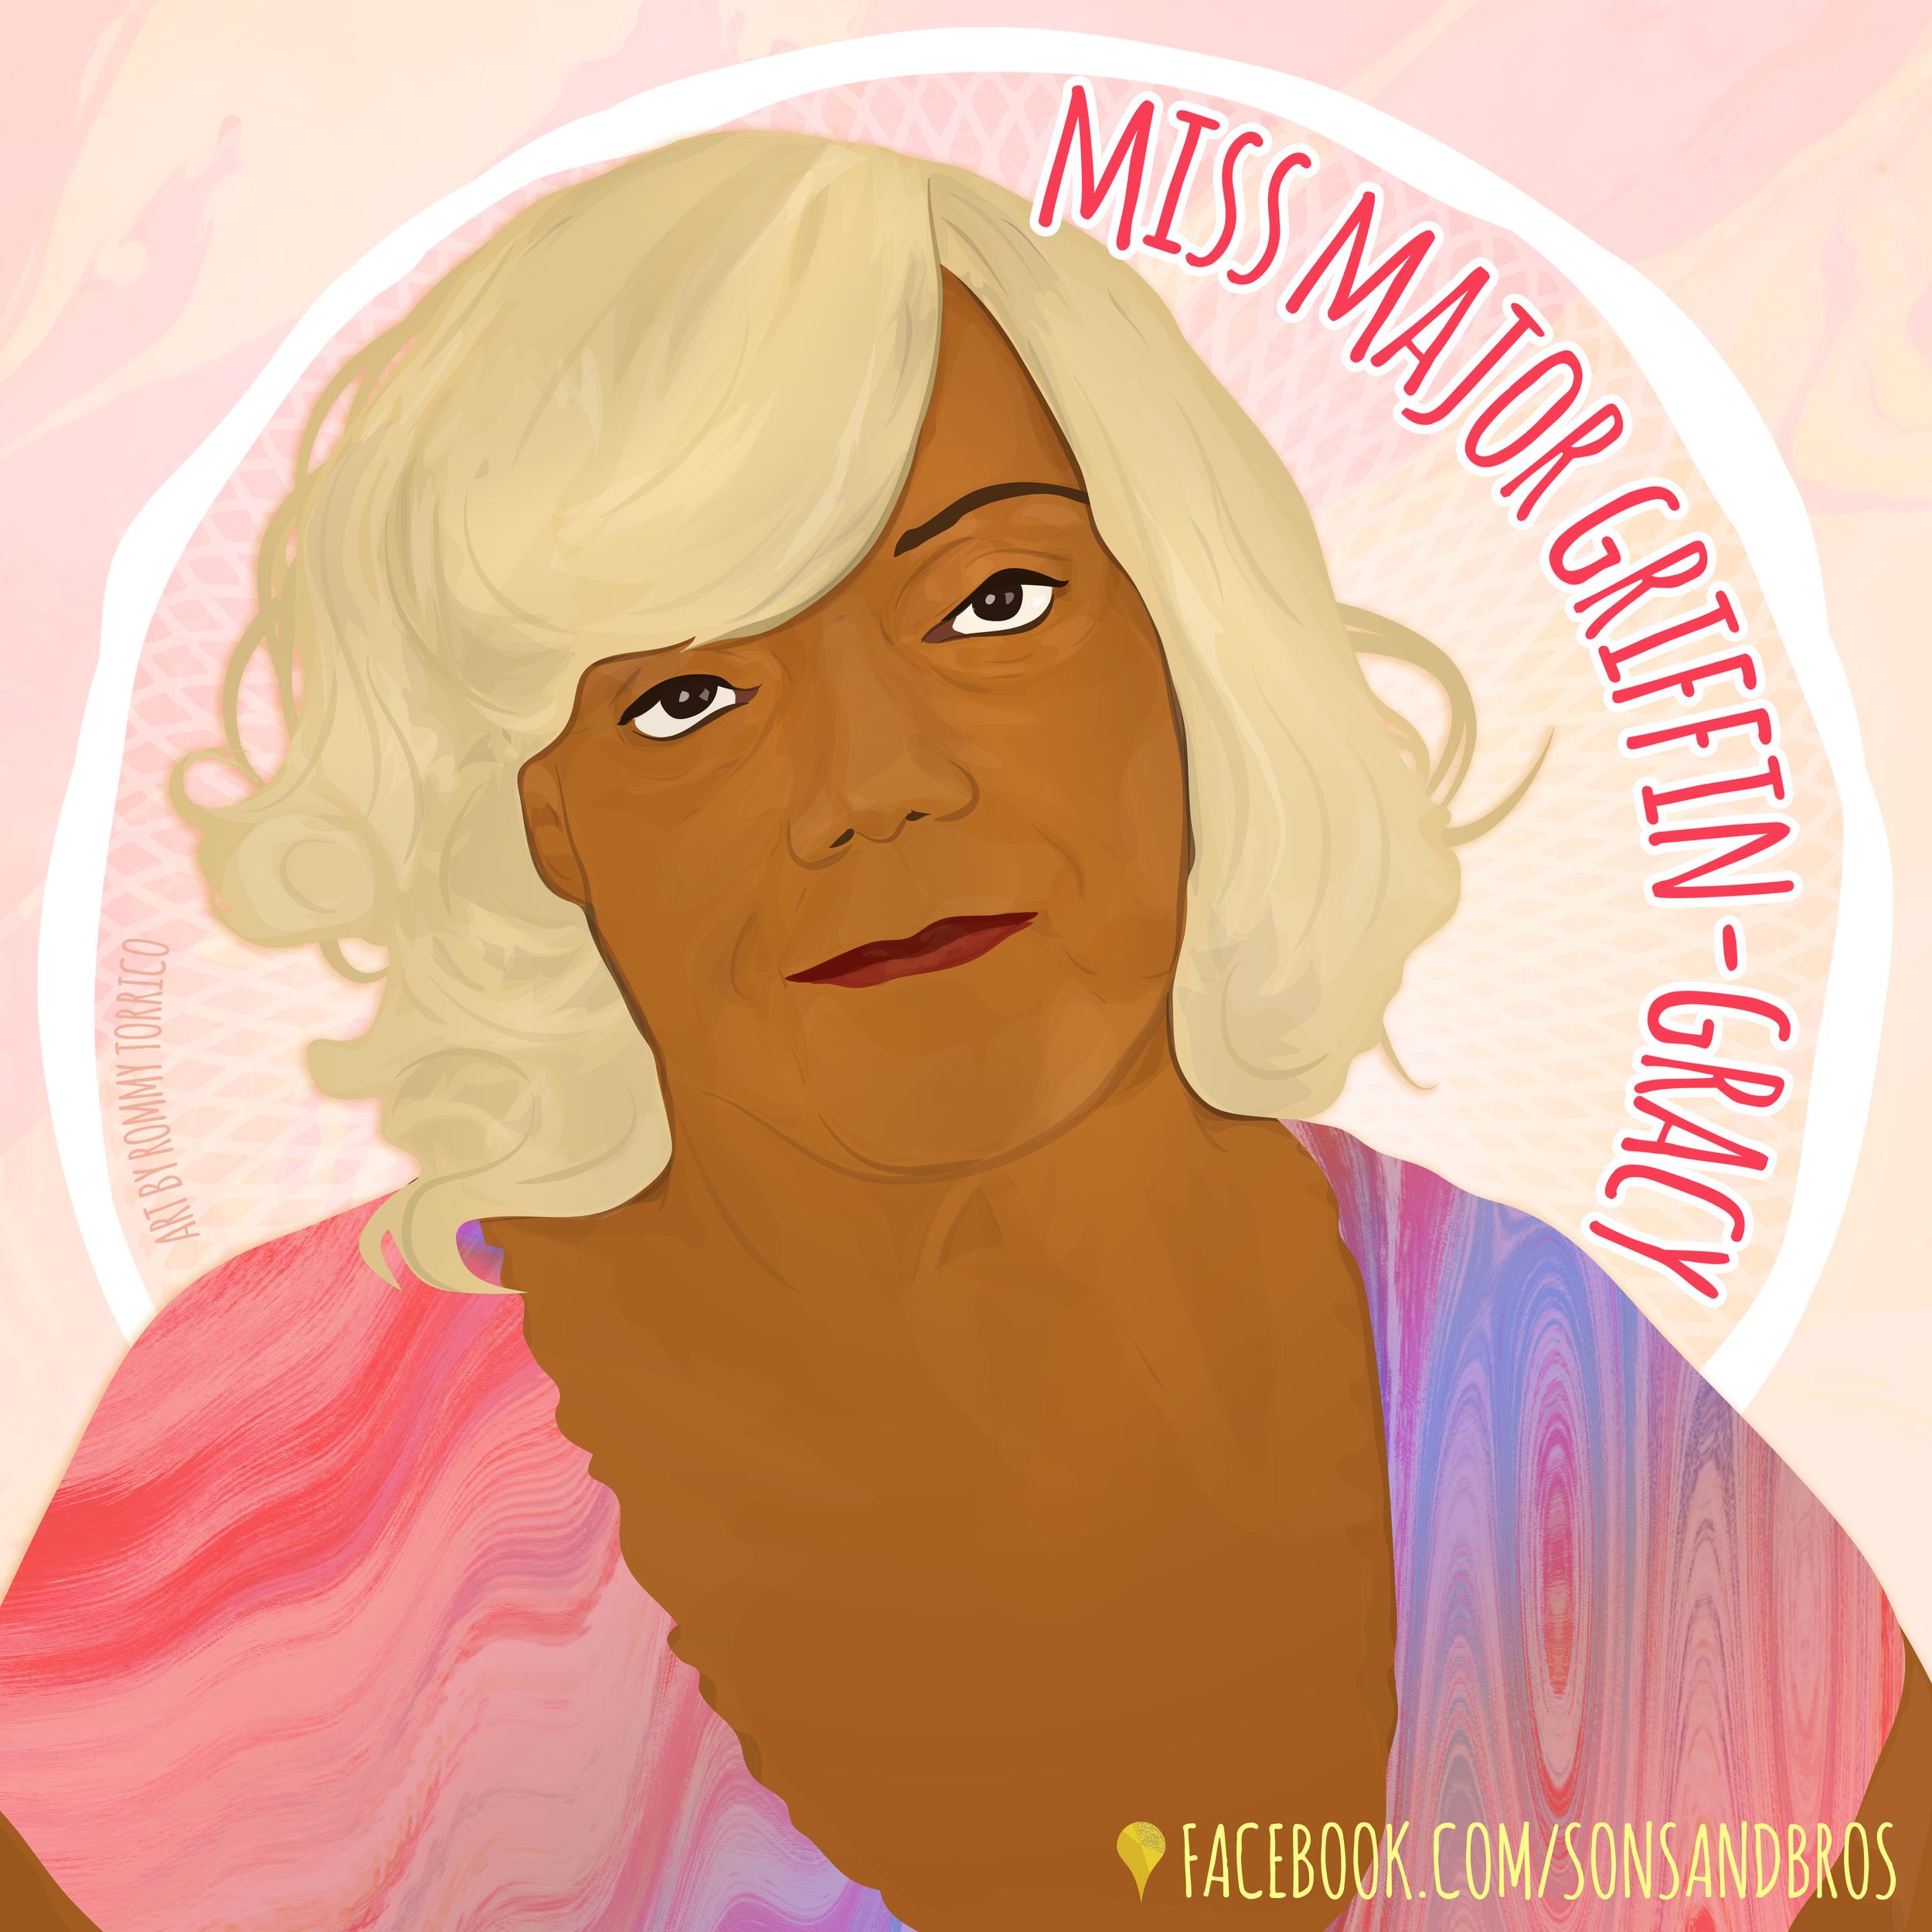 Miss Major_smaller.jpg